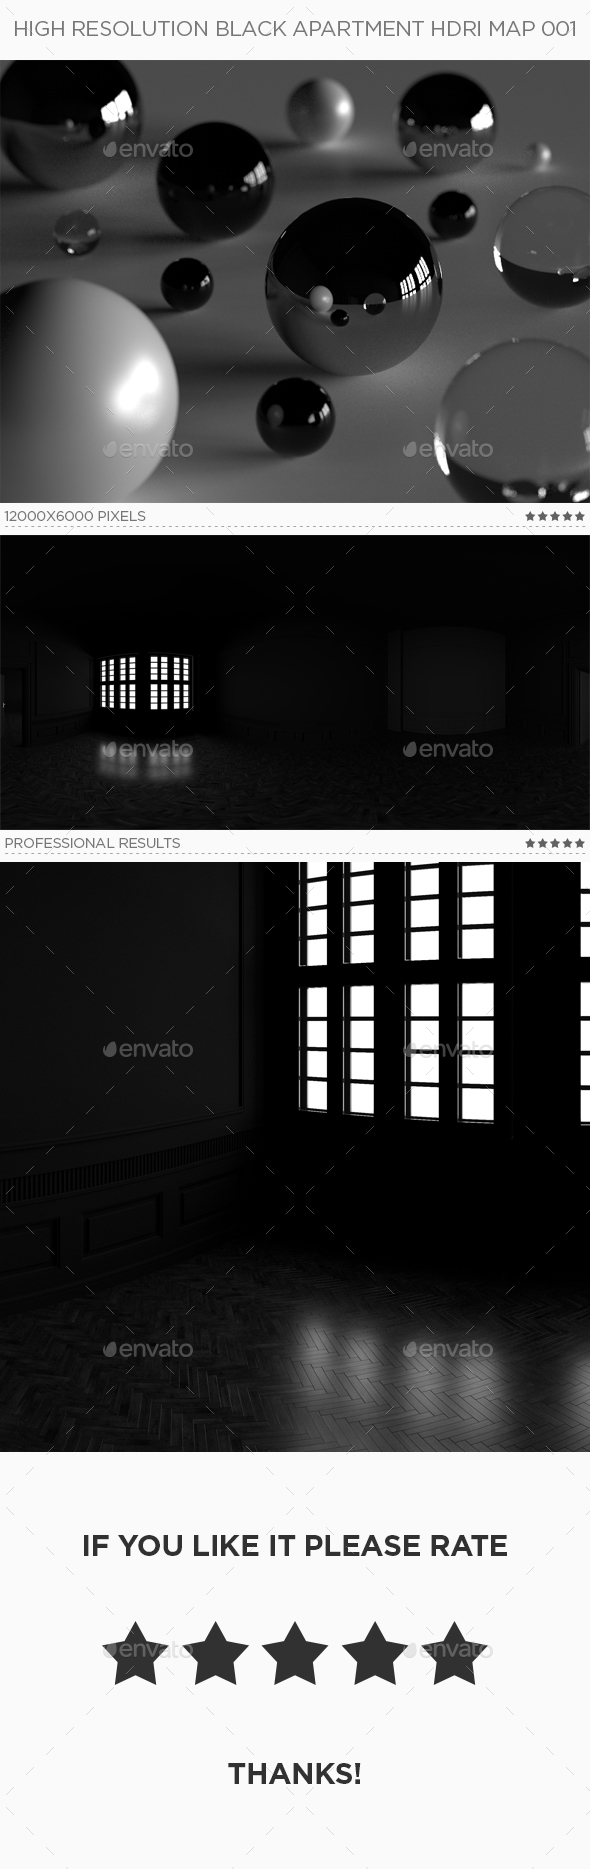 High Resolution Black Apartment HDRi Map 001 - 3DOcean Item for Sale